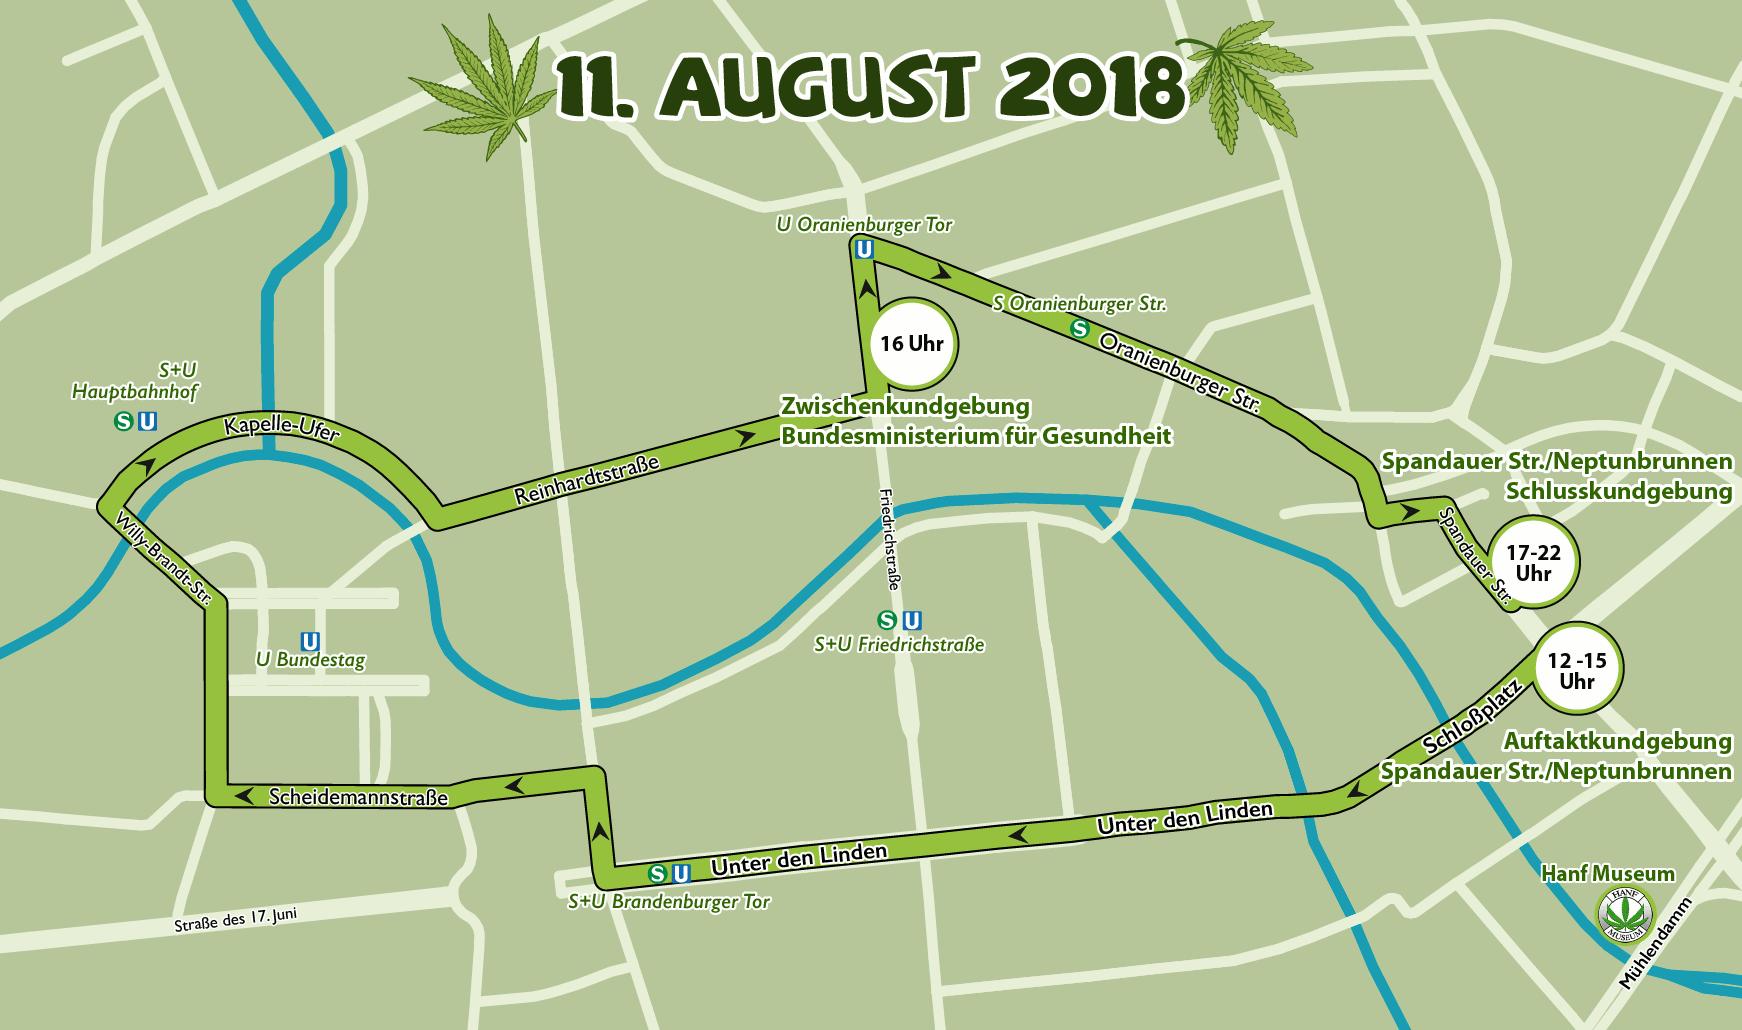 Route der Hanfparade 2018 in Berlin